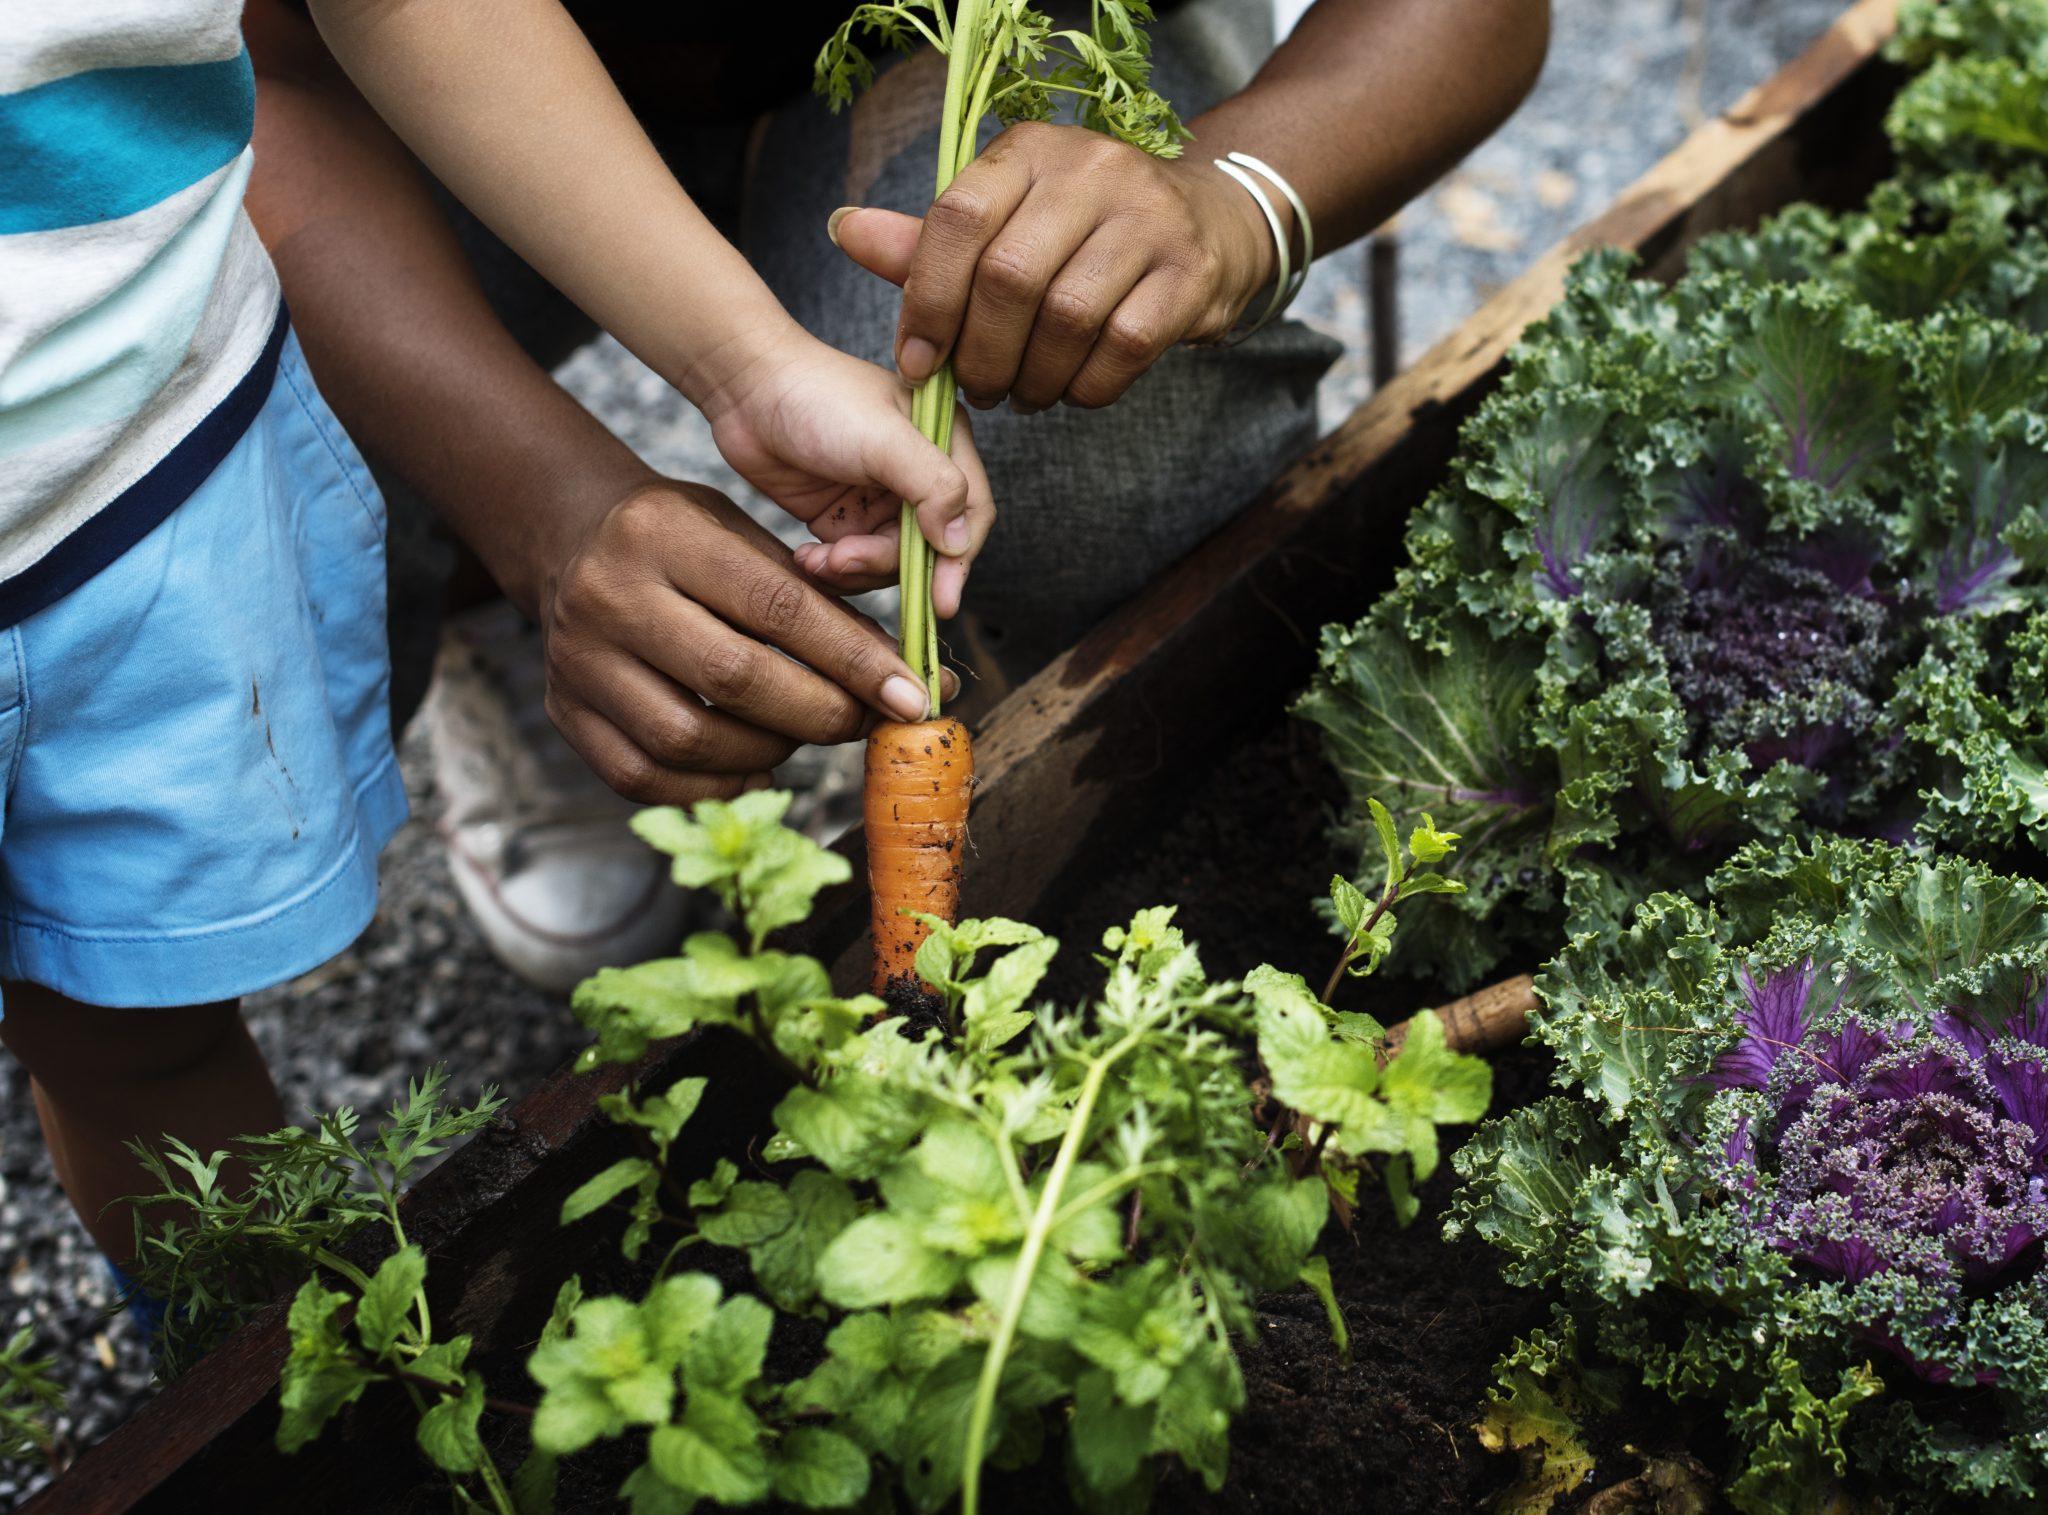 Children picking a baby carrot in a garden